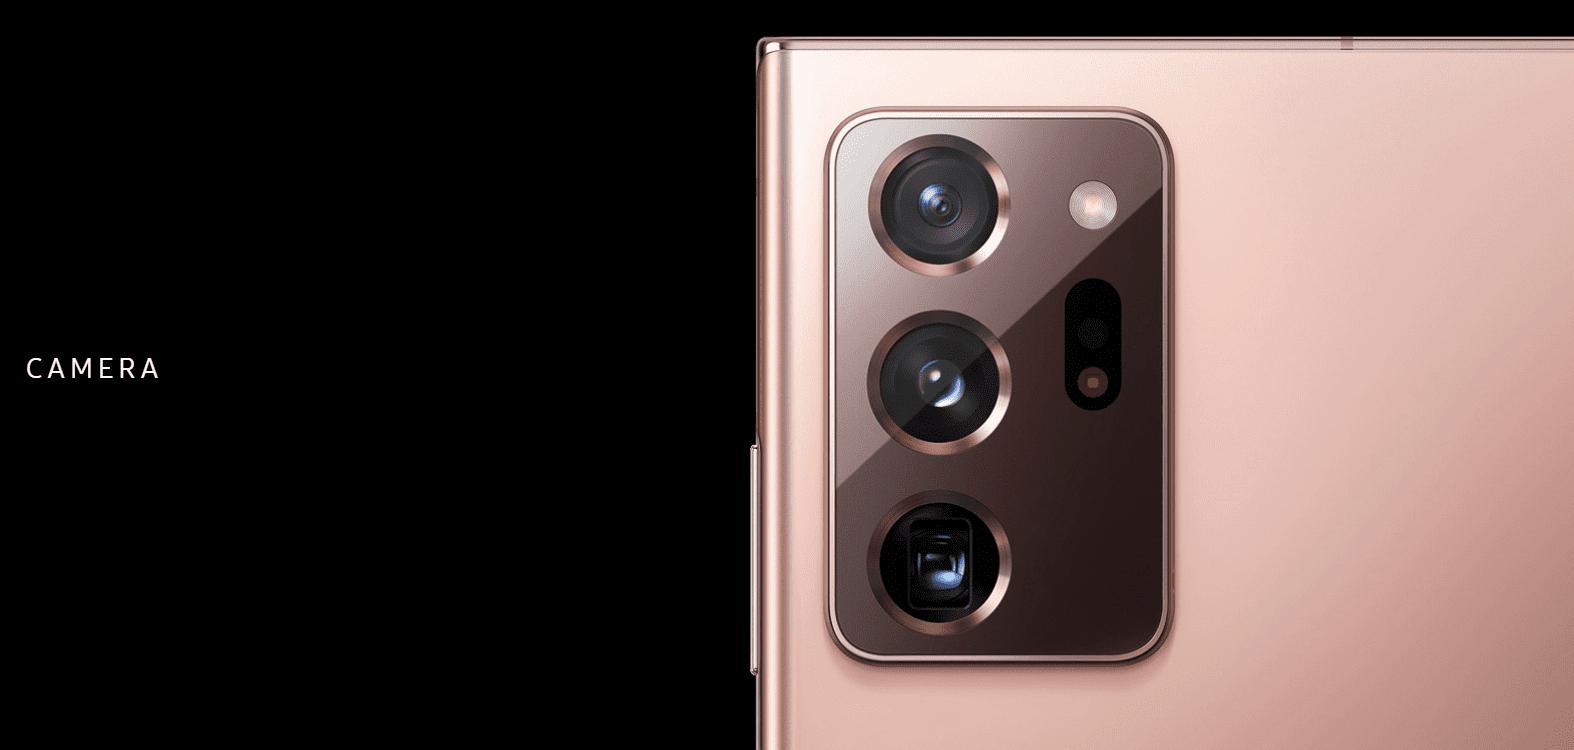 Samsung Galaxy Note 20 Ultra Cameras